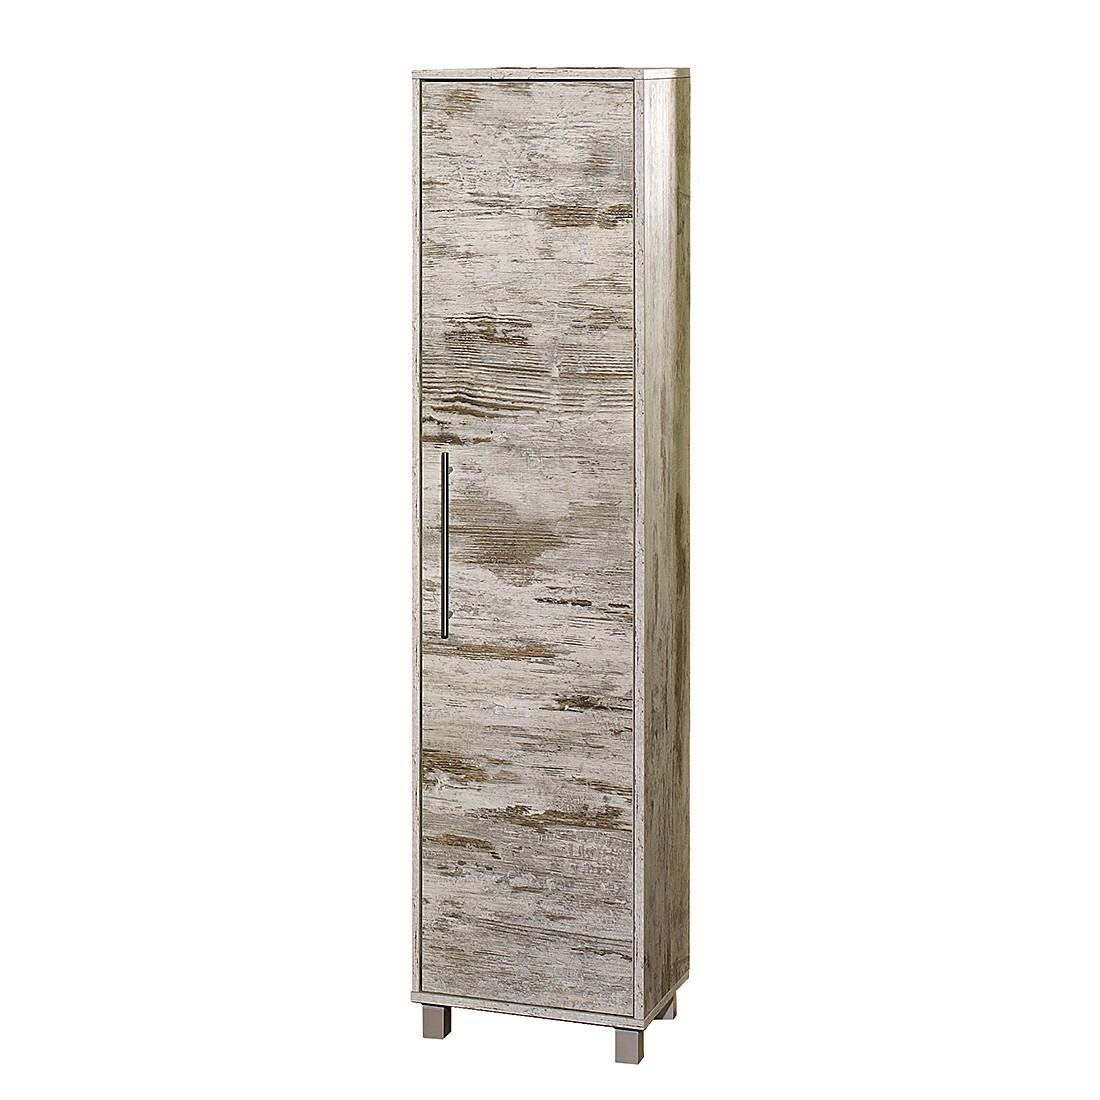 Armoire colonne Moncton - 1 porte - Chêne vielli, Schildmeyer